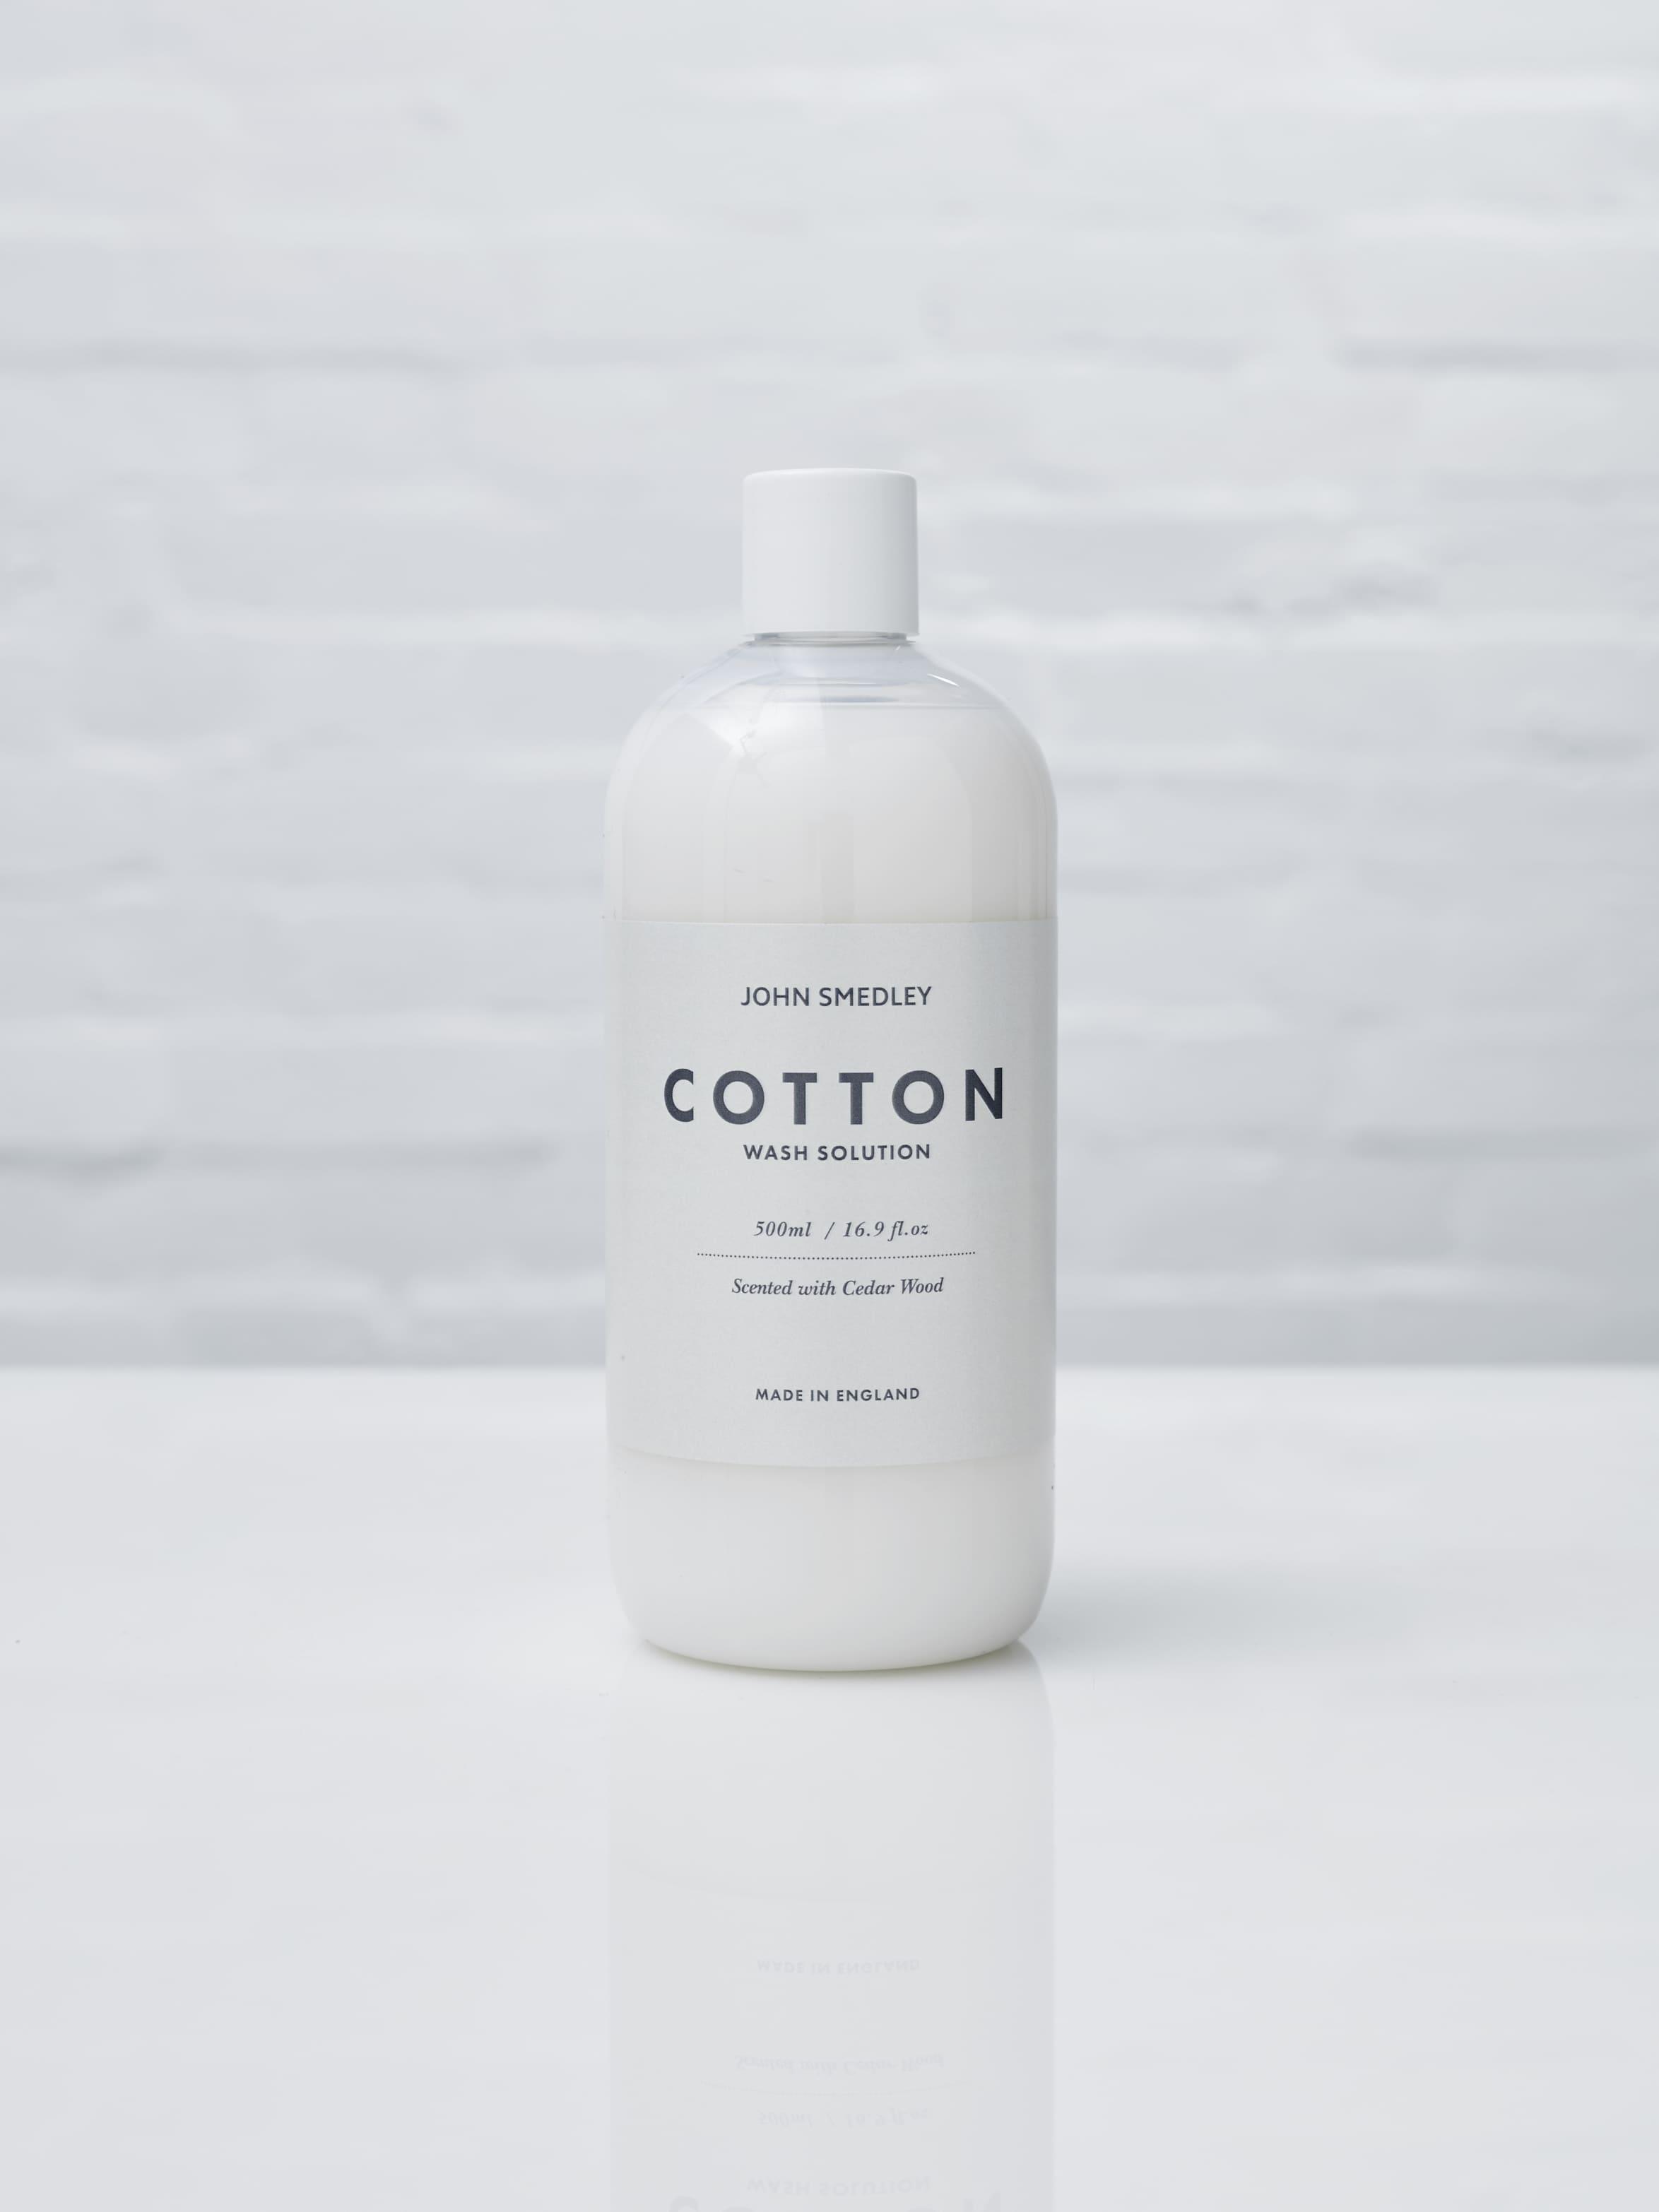 John Smedley Cotton Wash Solution